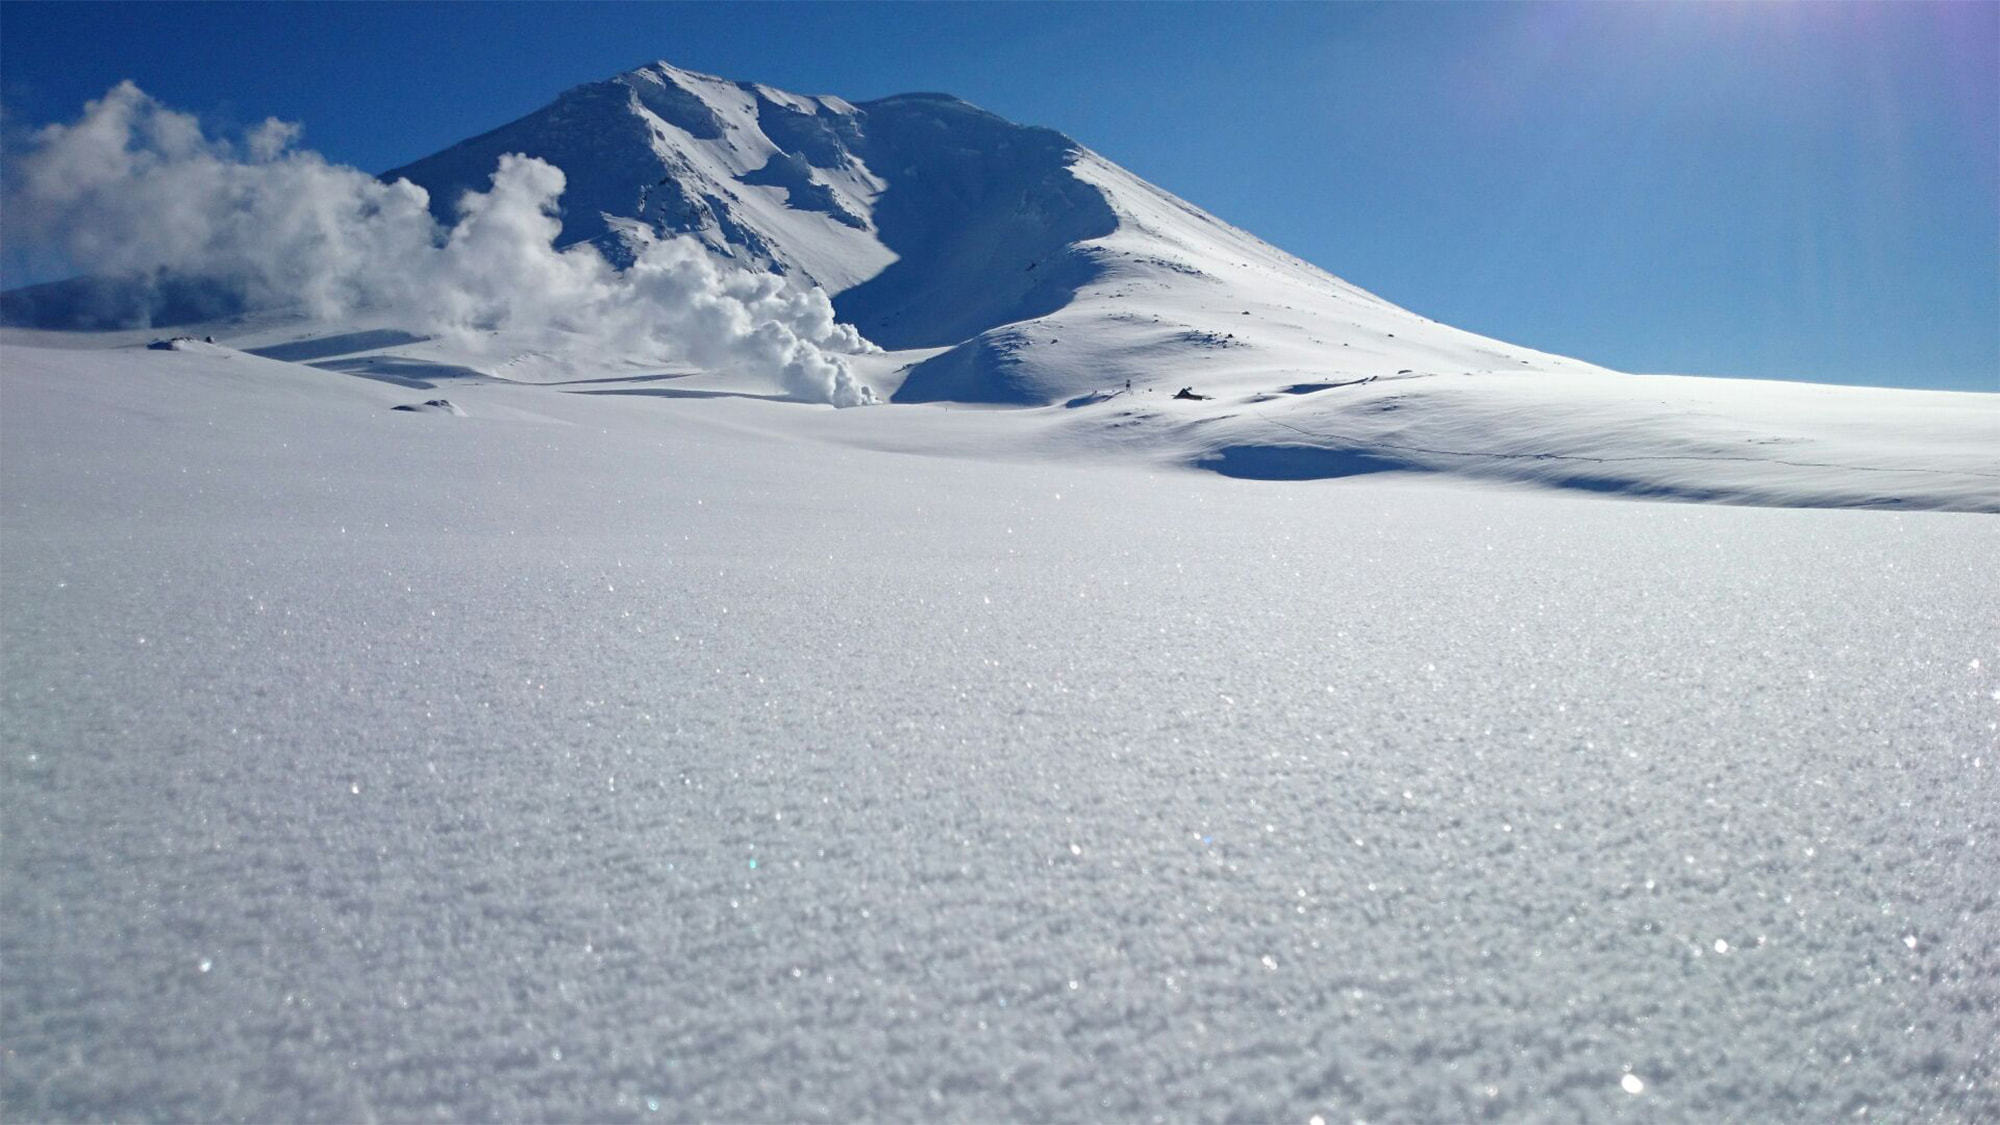 大雪山旭岳の冬景色